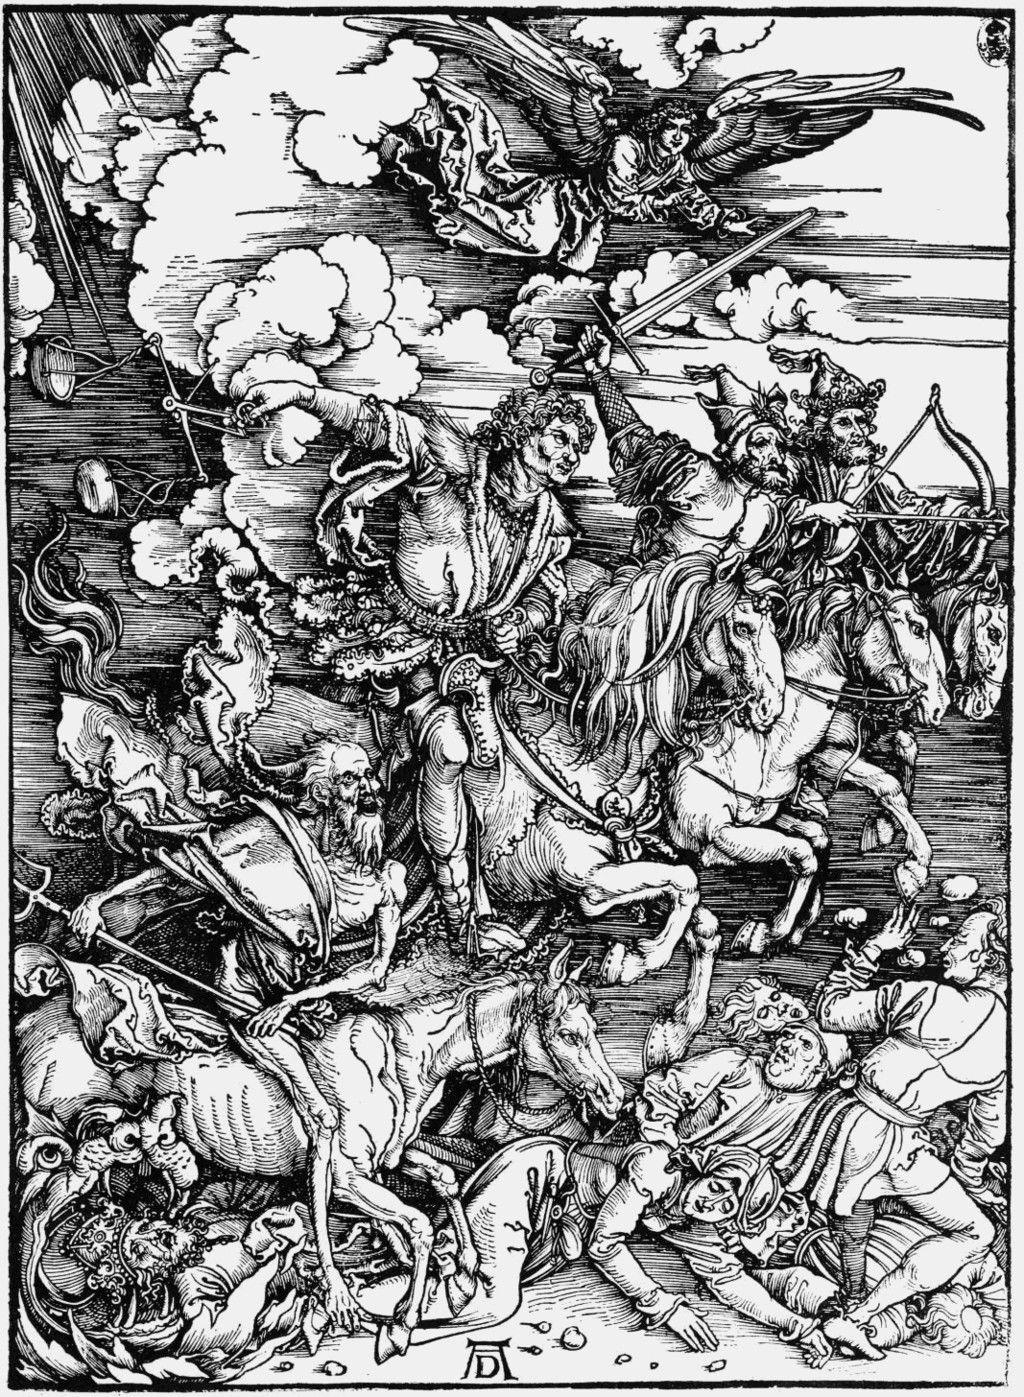 Albrecht Dürer, woodcut, The Four Horsemen of the Apocalypse